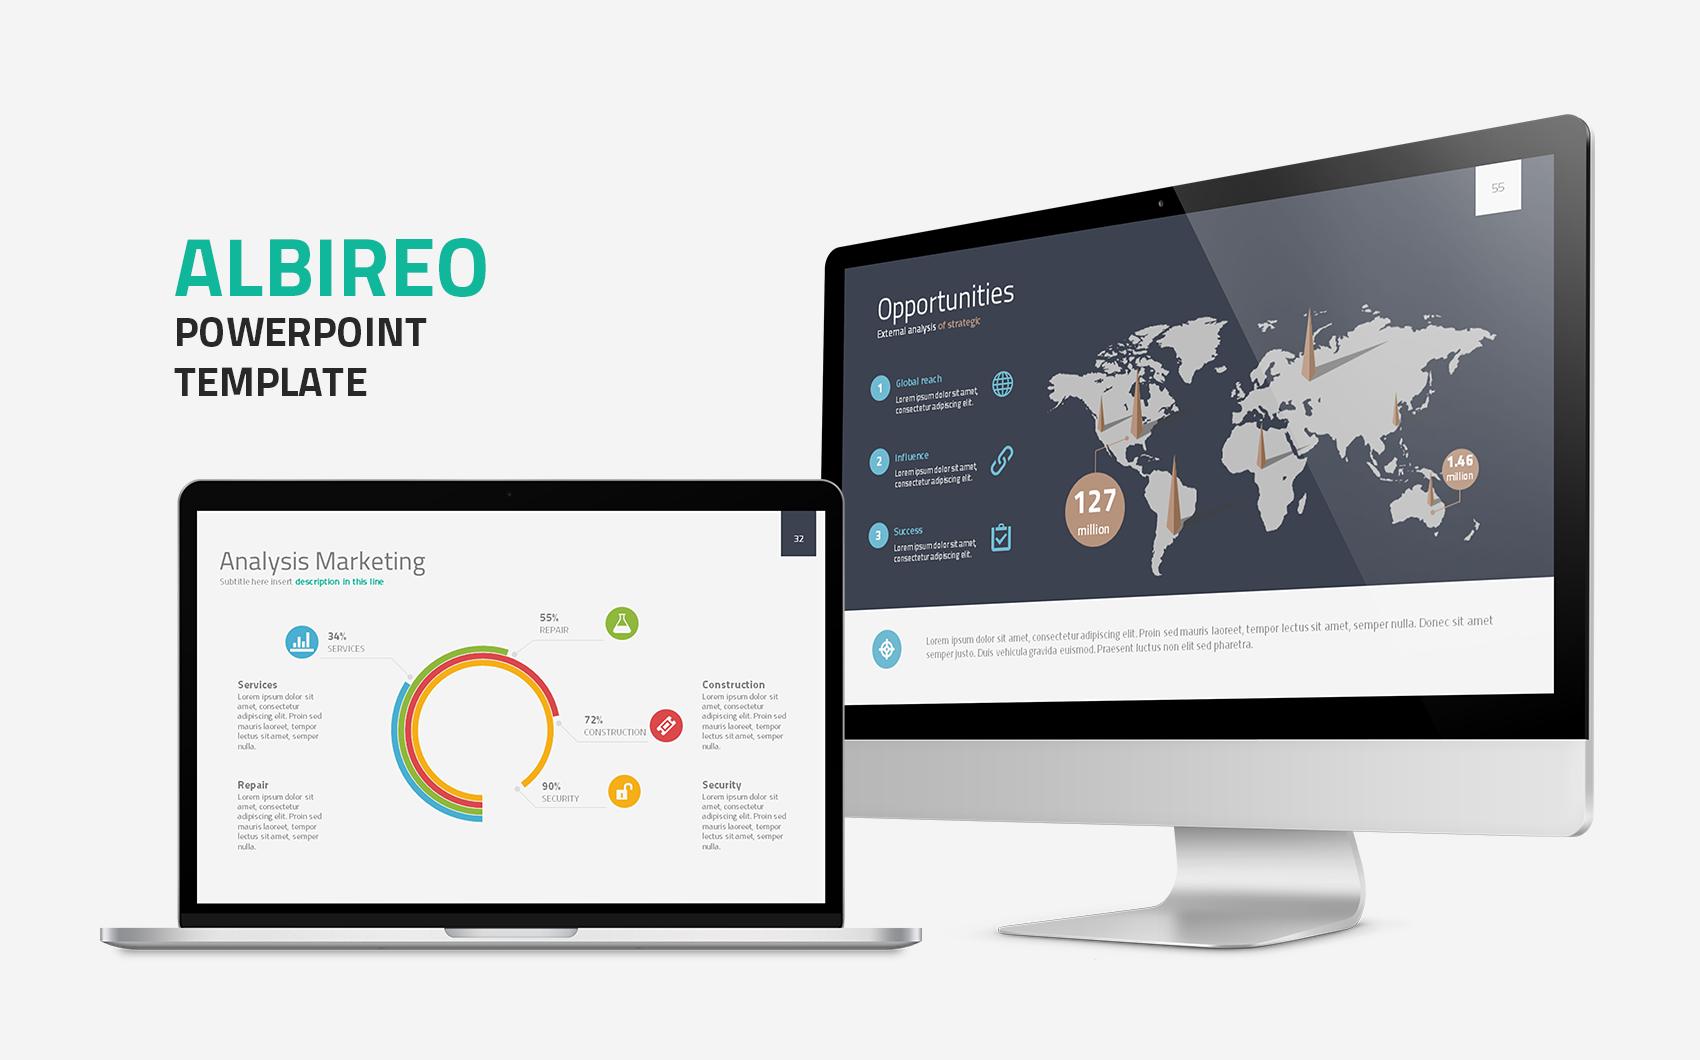 Albireo Powerpoint Template Template PowerPoint №64470